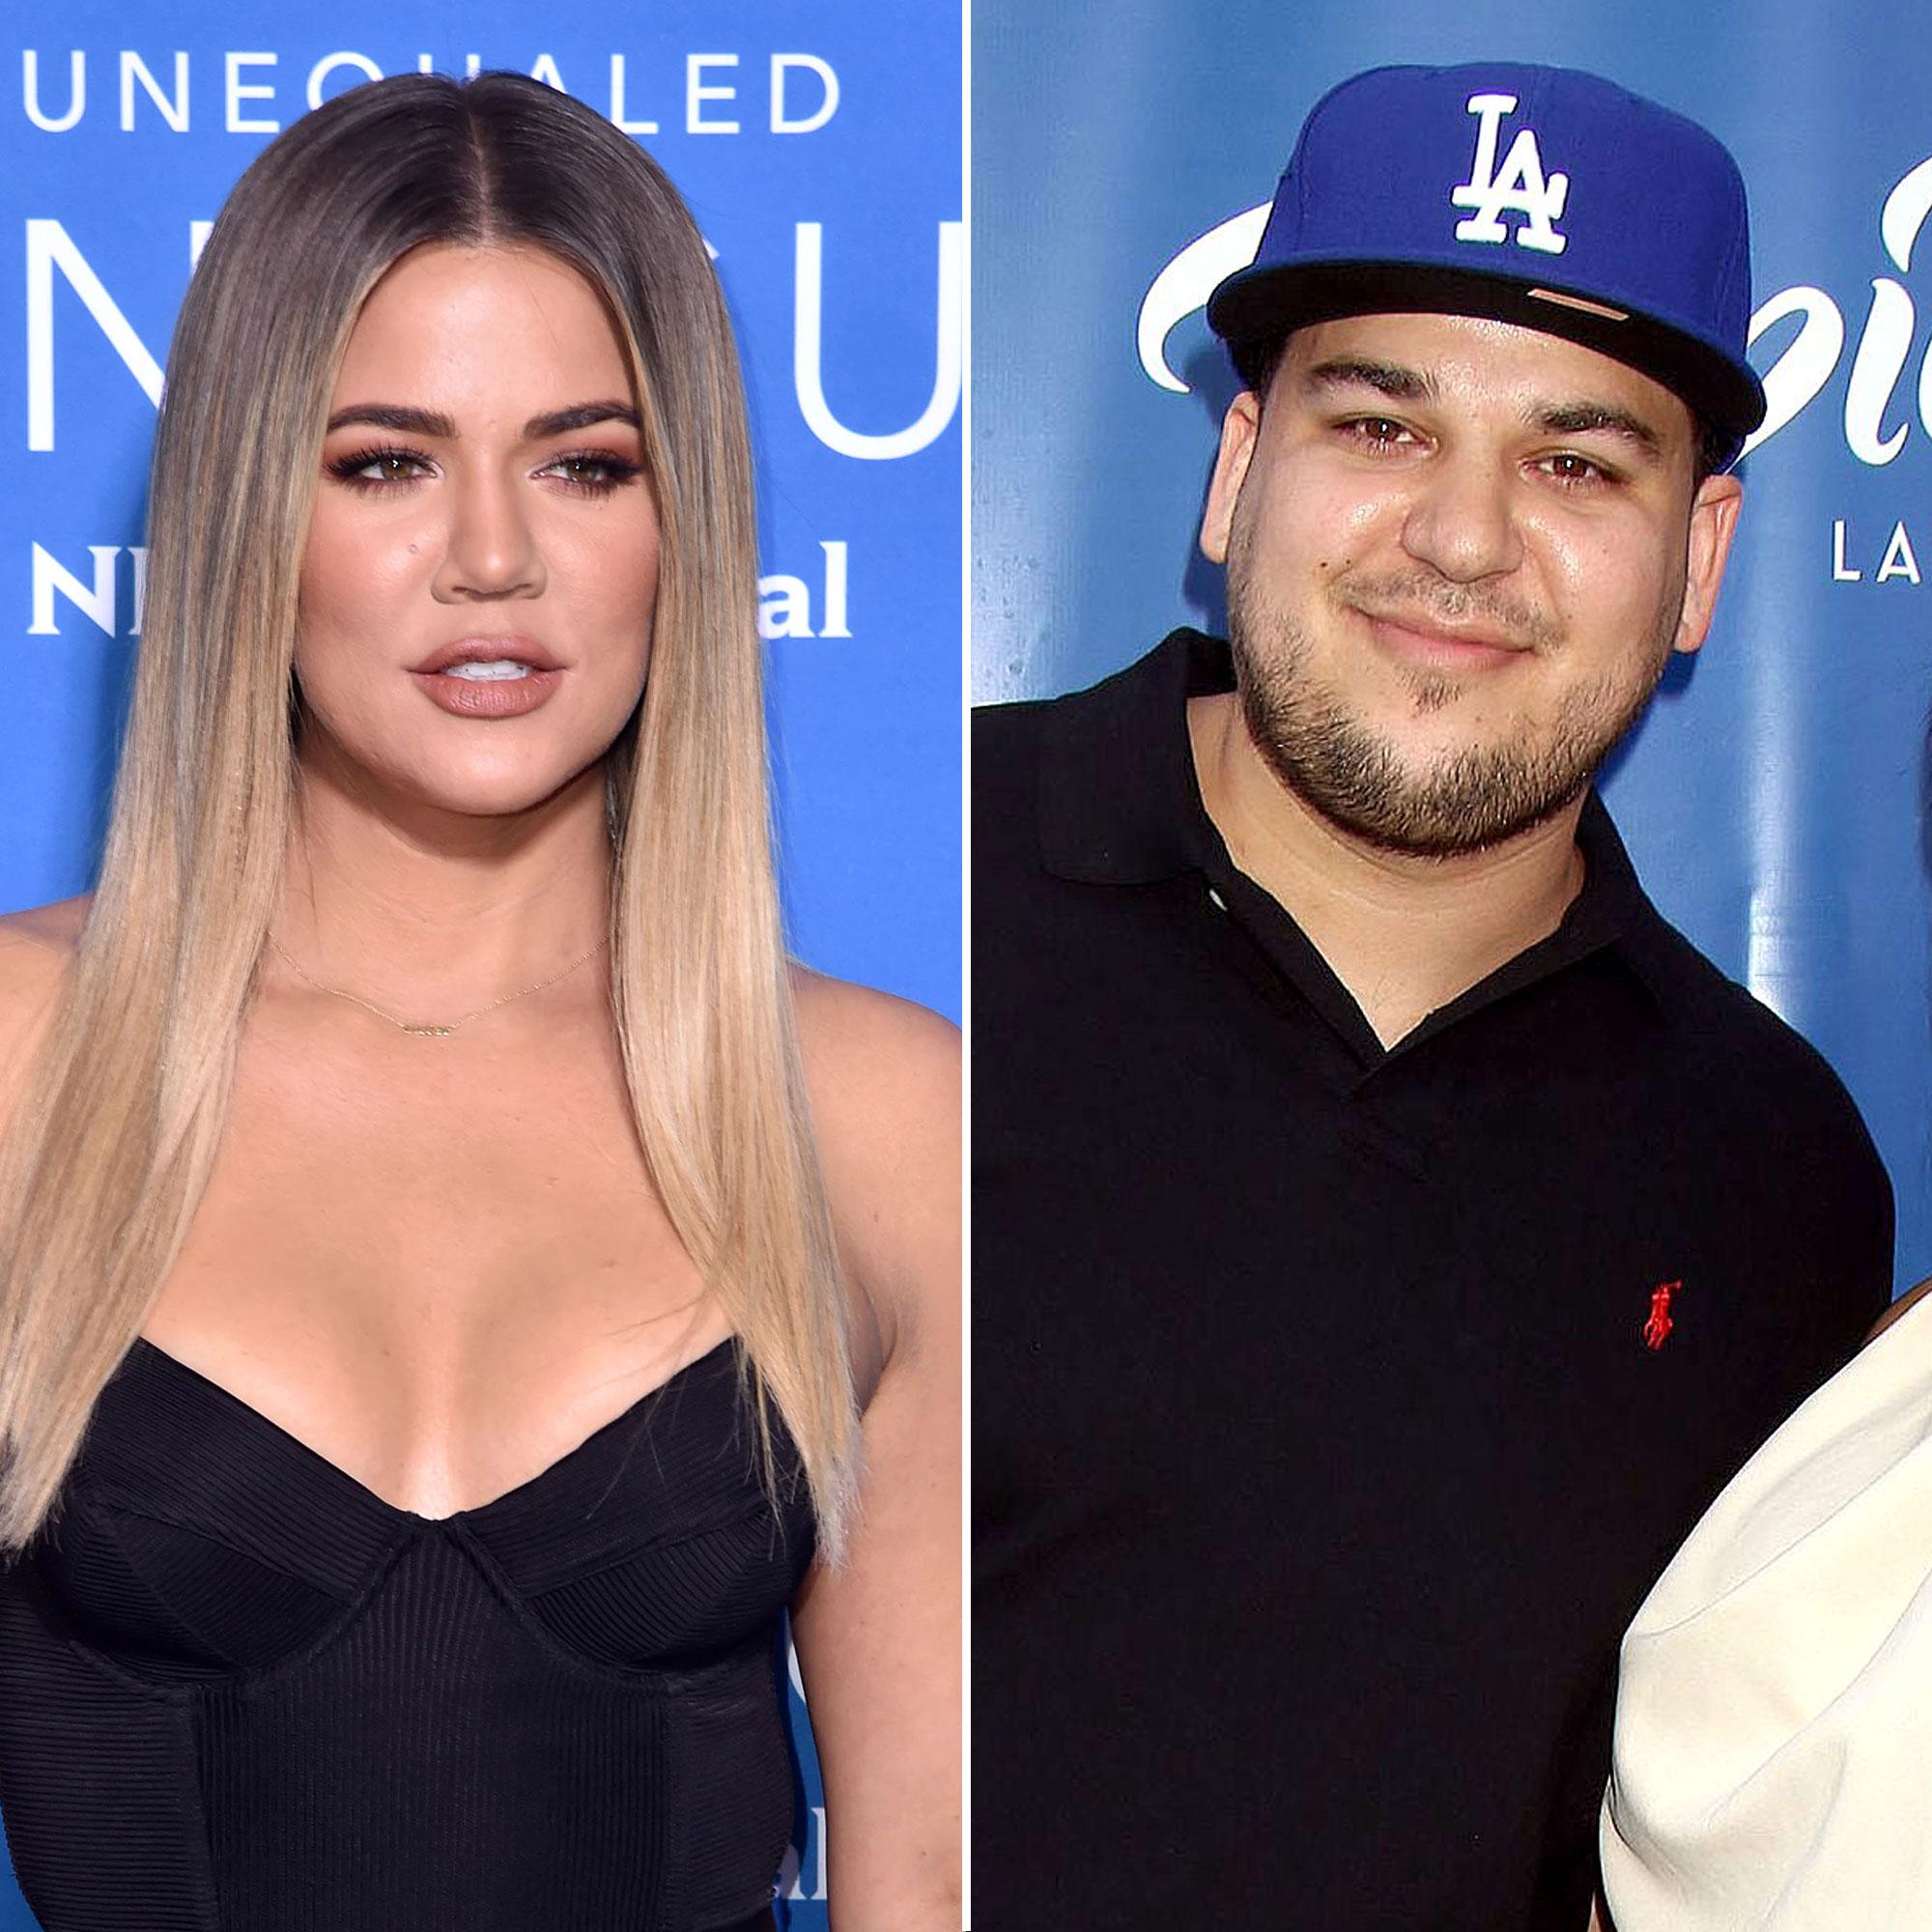 Kardashian now is rob where Khloé Kardashian